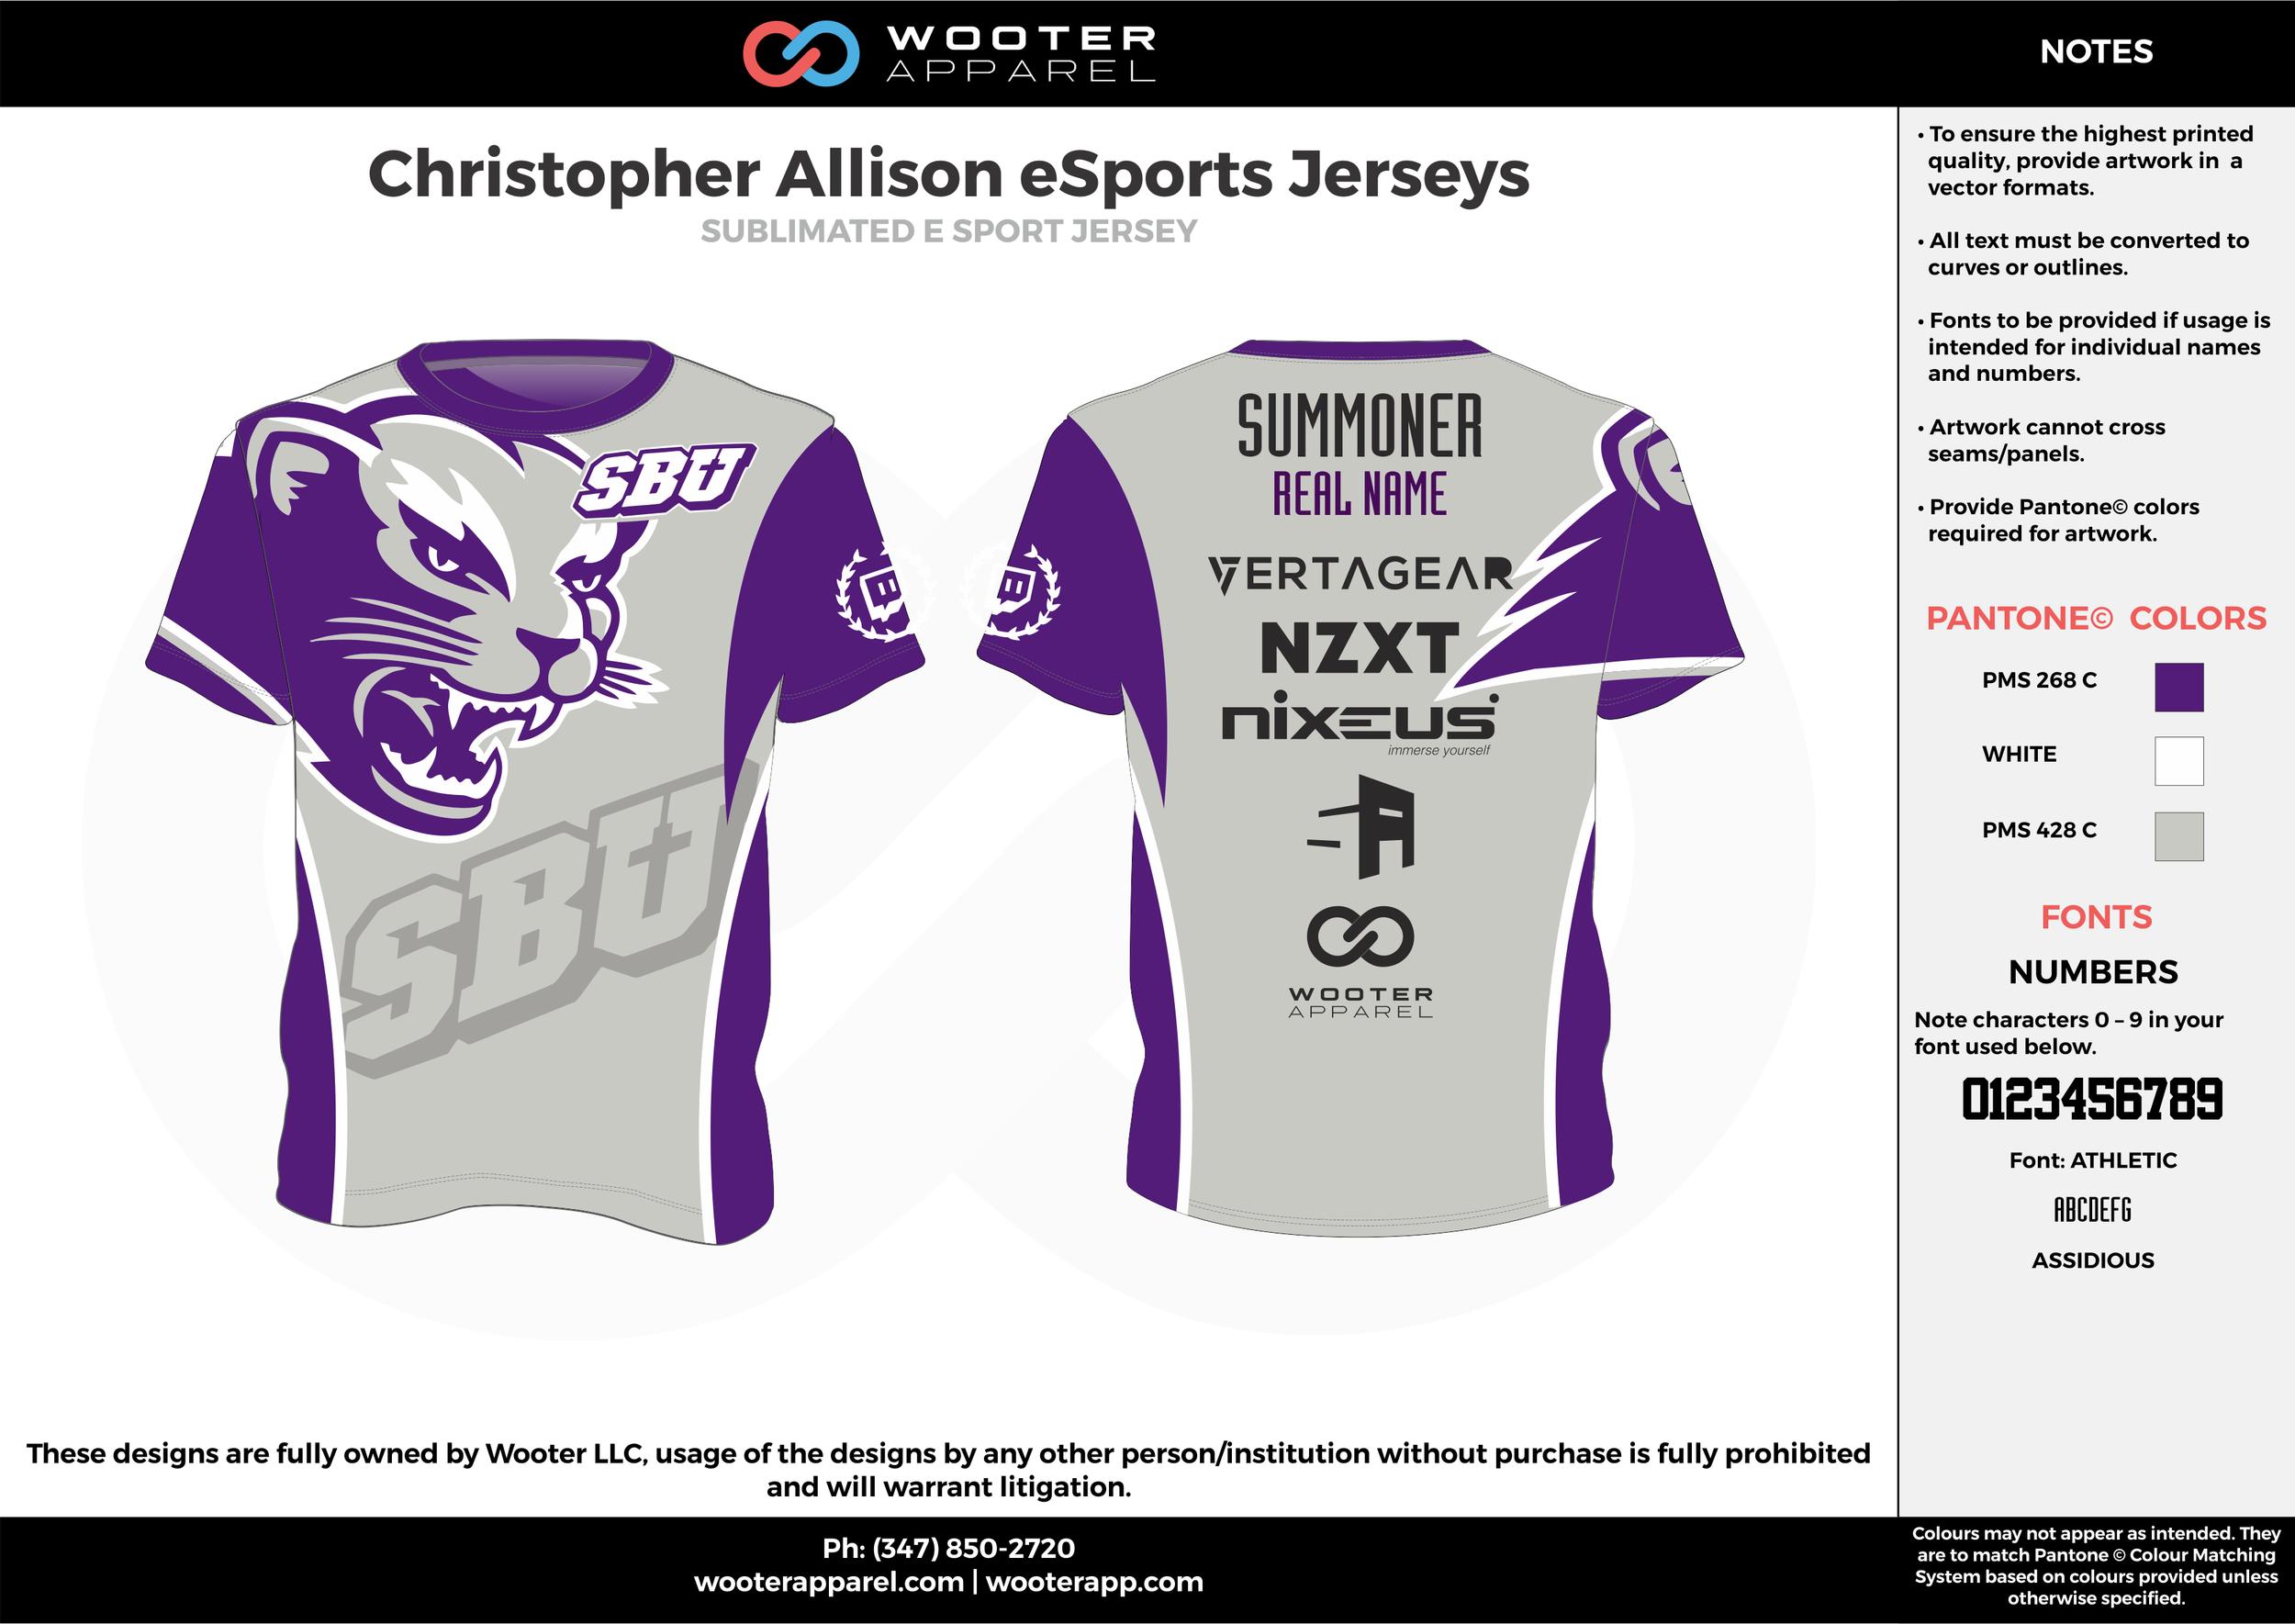 Christopher Allison eSports Jerseys gray purple white e-sports jerseys, shirts, uniforms